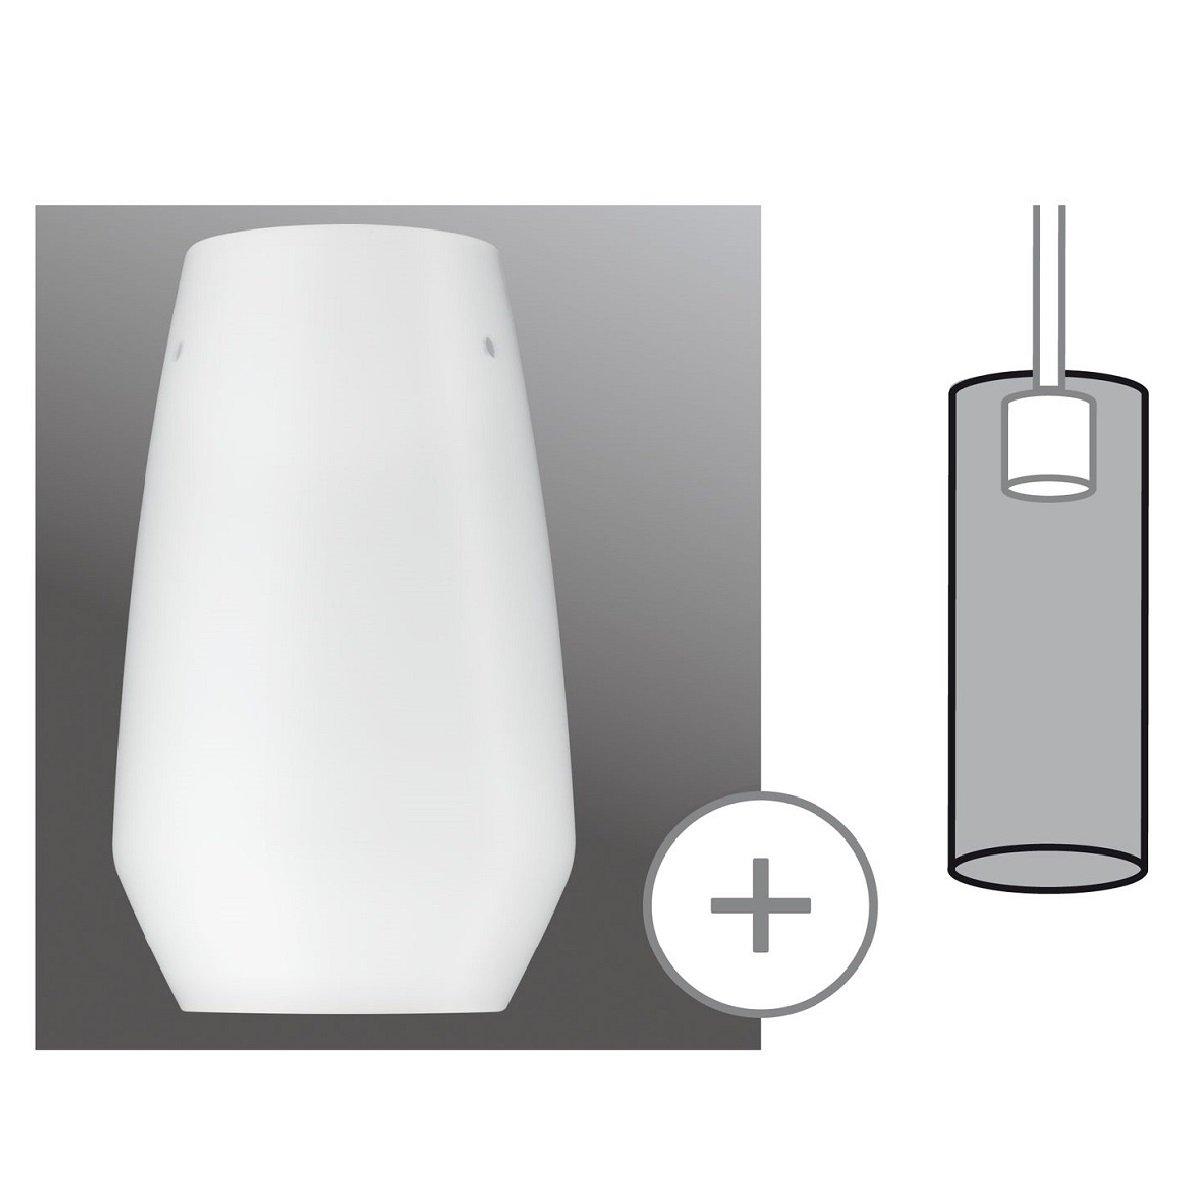 paulmann no 95354 lampenschirm urail 2easy glas vento opal glas eur 34 99 leuchten lampen. Black Bedroom Furniture Sets. Home Design Ideas